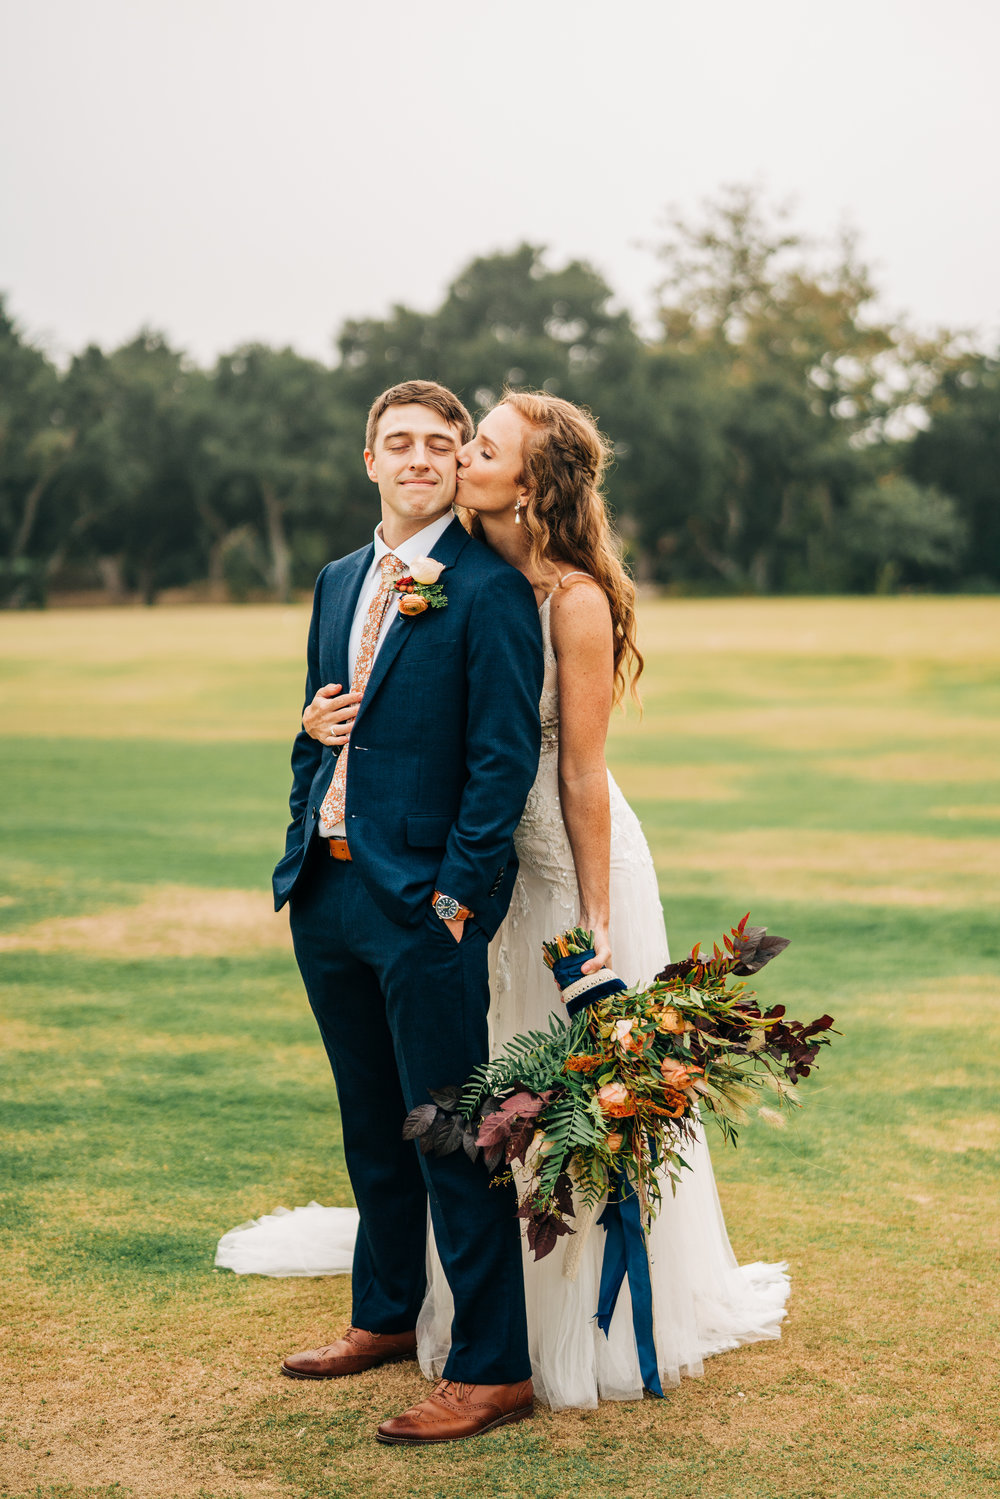 www.santabarbarawedding.com | Brandon Bibbins Photography | The Cottages at Polo Run | Christina Welch Floral | Bride Kisses Groom